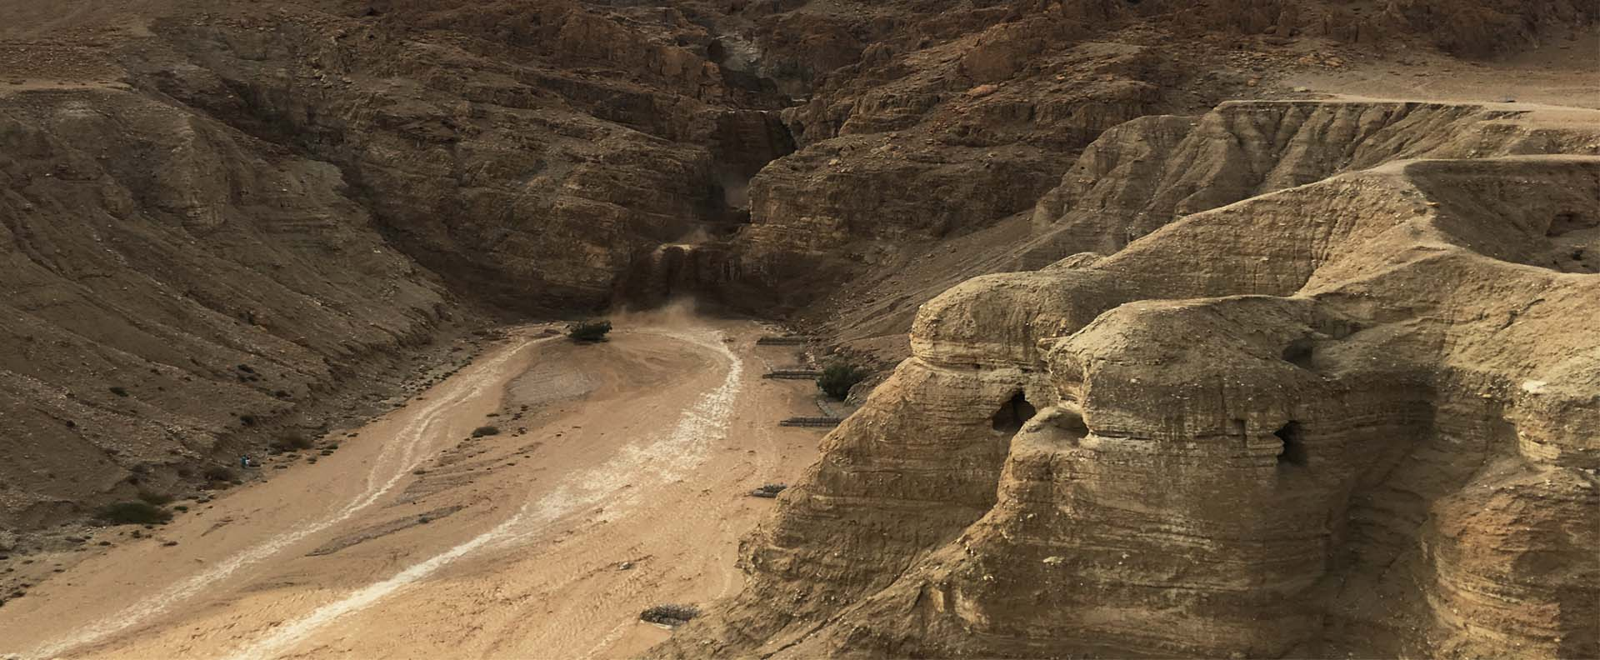 Qumran and Dead Sea Scrolls